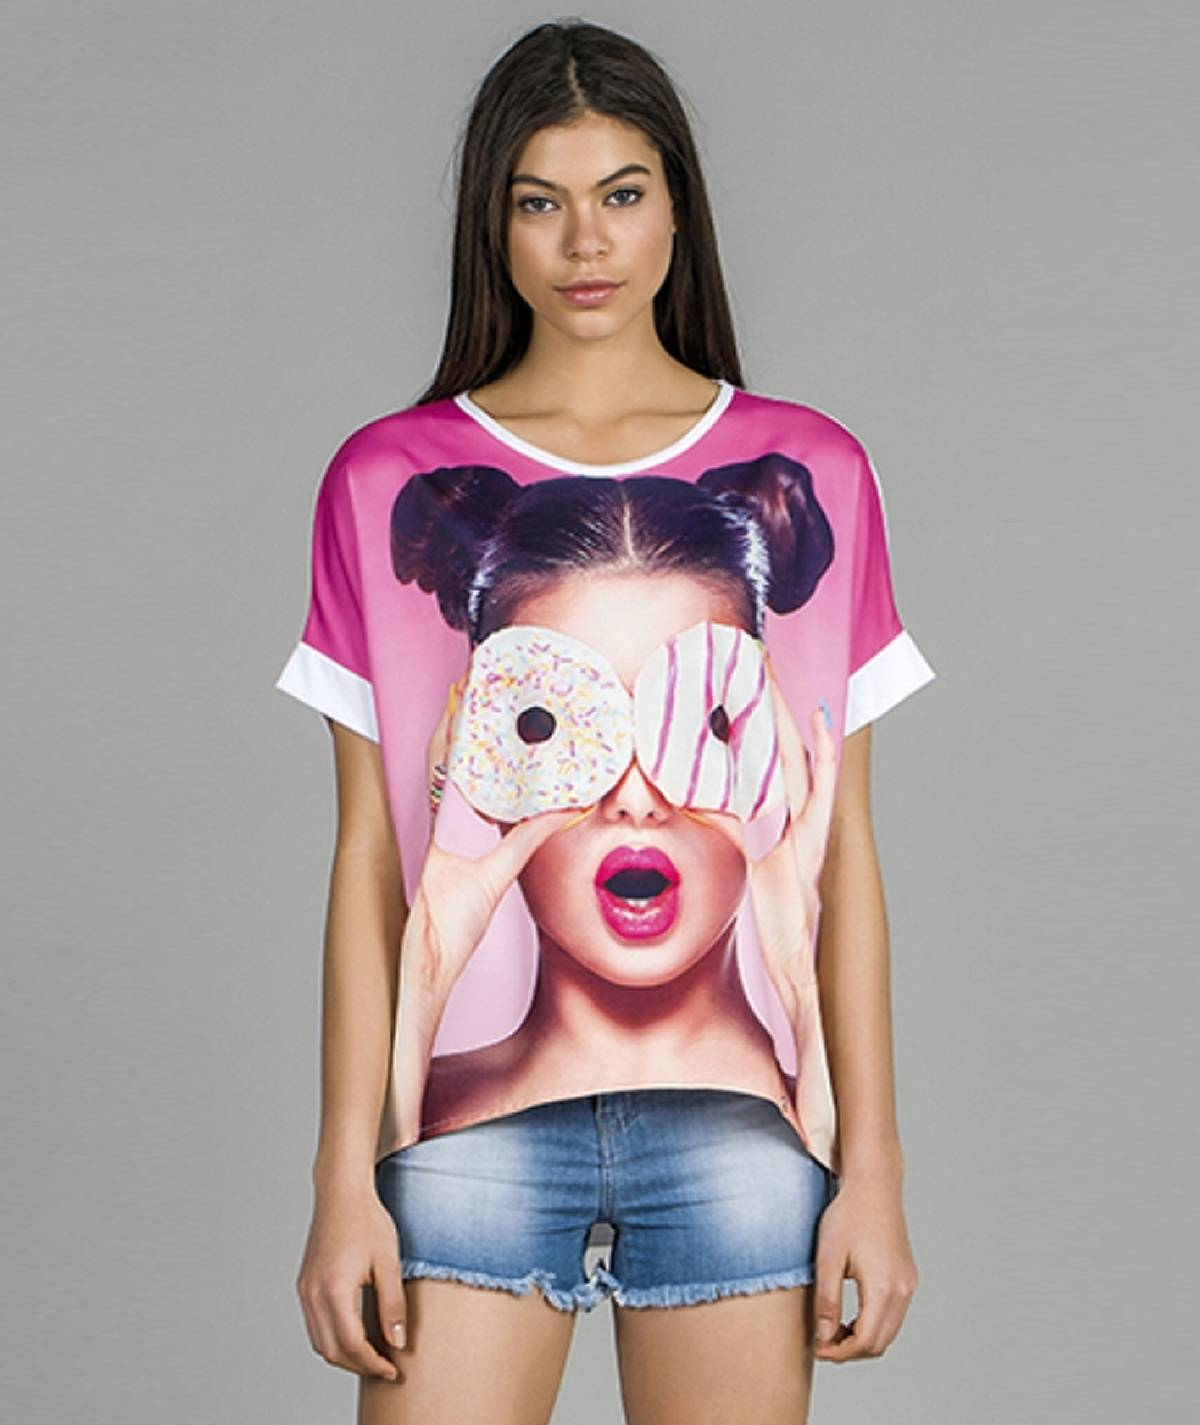 T-shirt motivo donuts